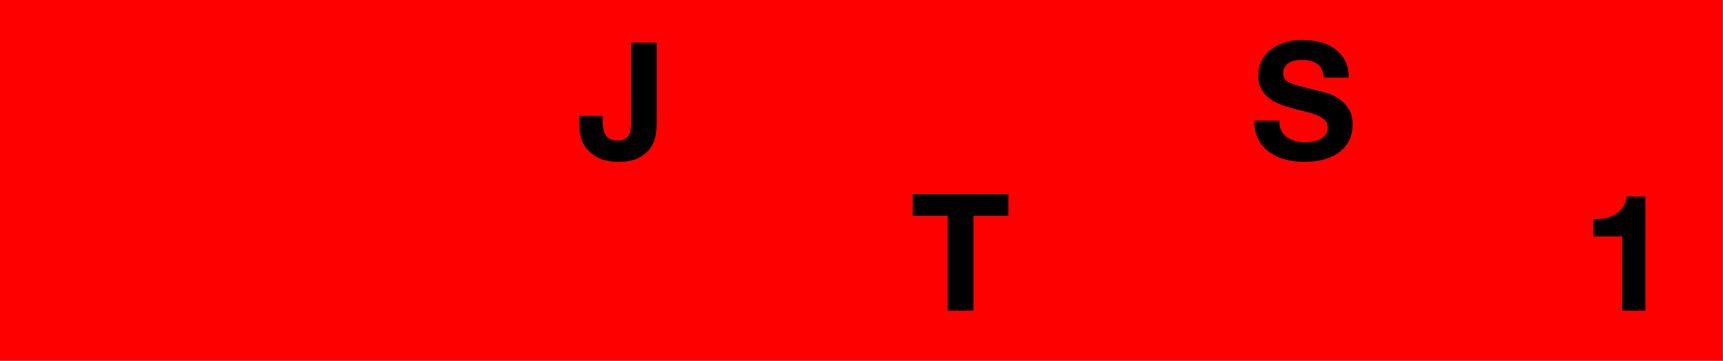 NicoloBernardi-JTS1-CoverSoundCloud1.jpg